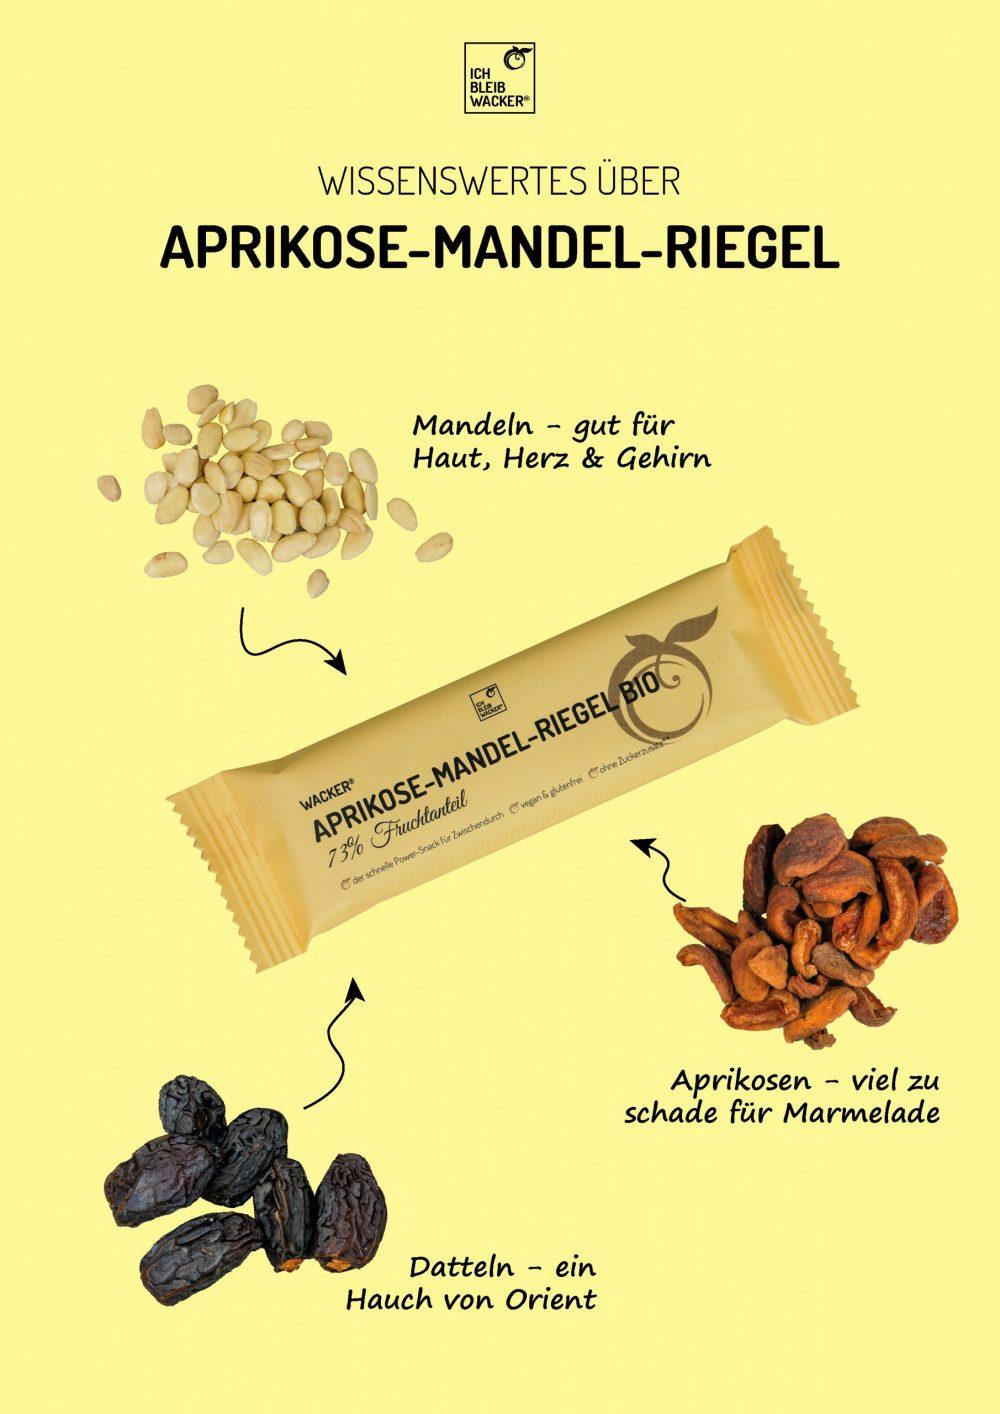 Infografik_Aprikose-Mandel-Riegel